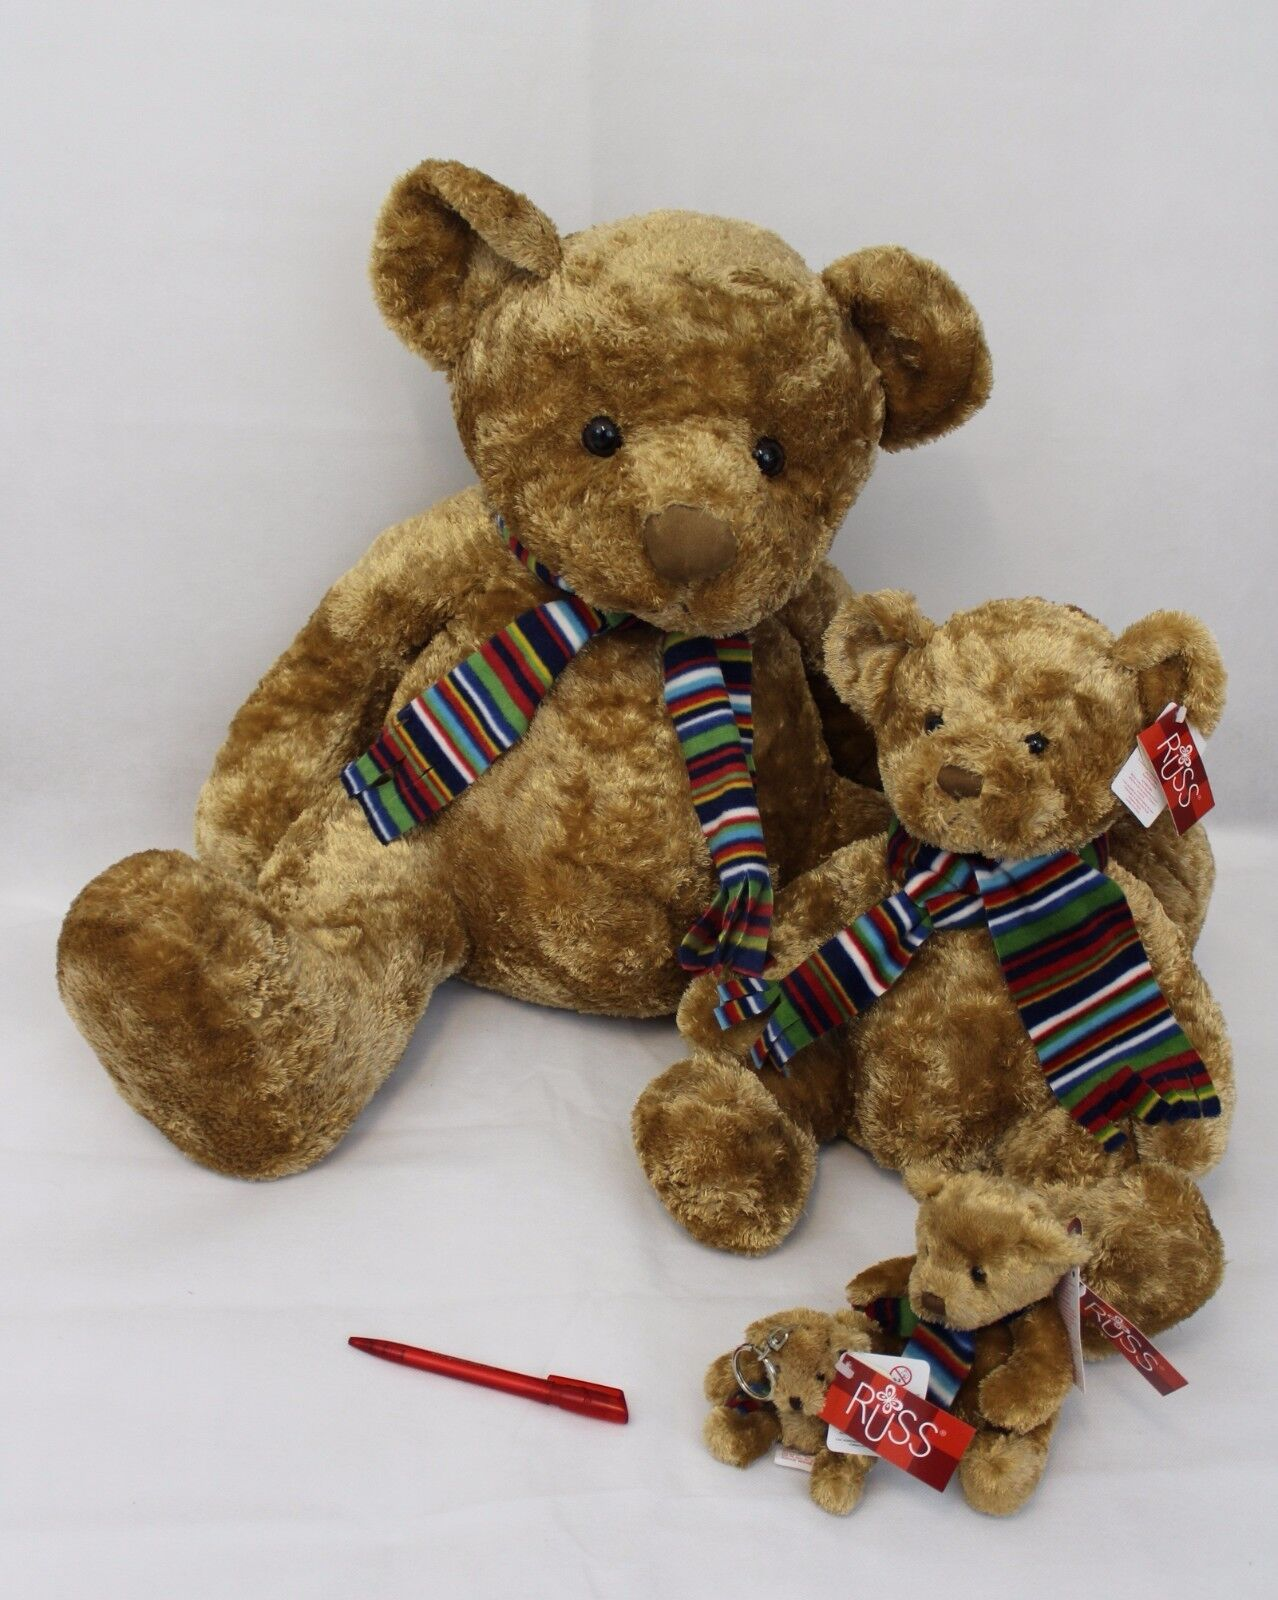 Teddy Bär  Russell  -  Kuscheltier von Russ    NEU